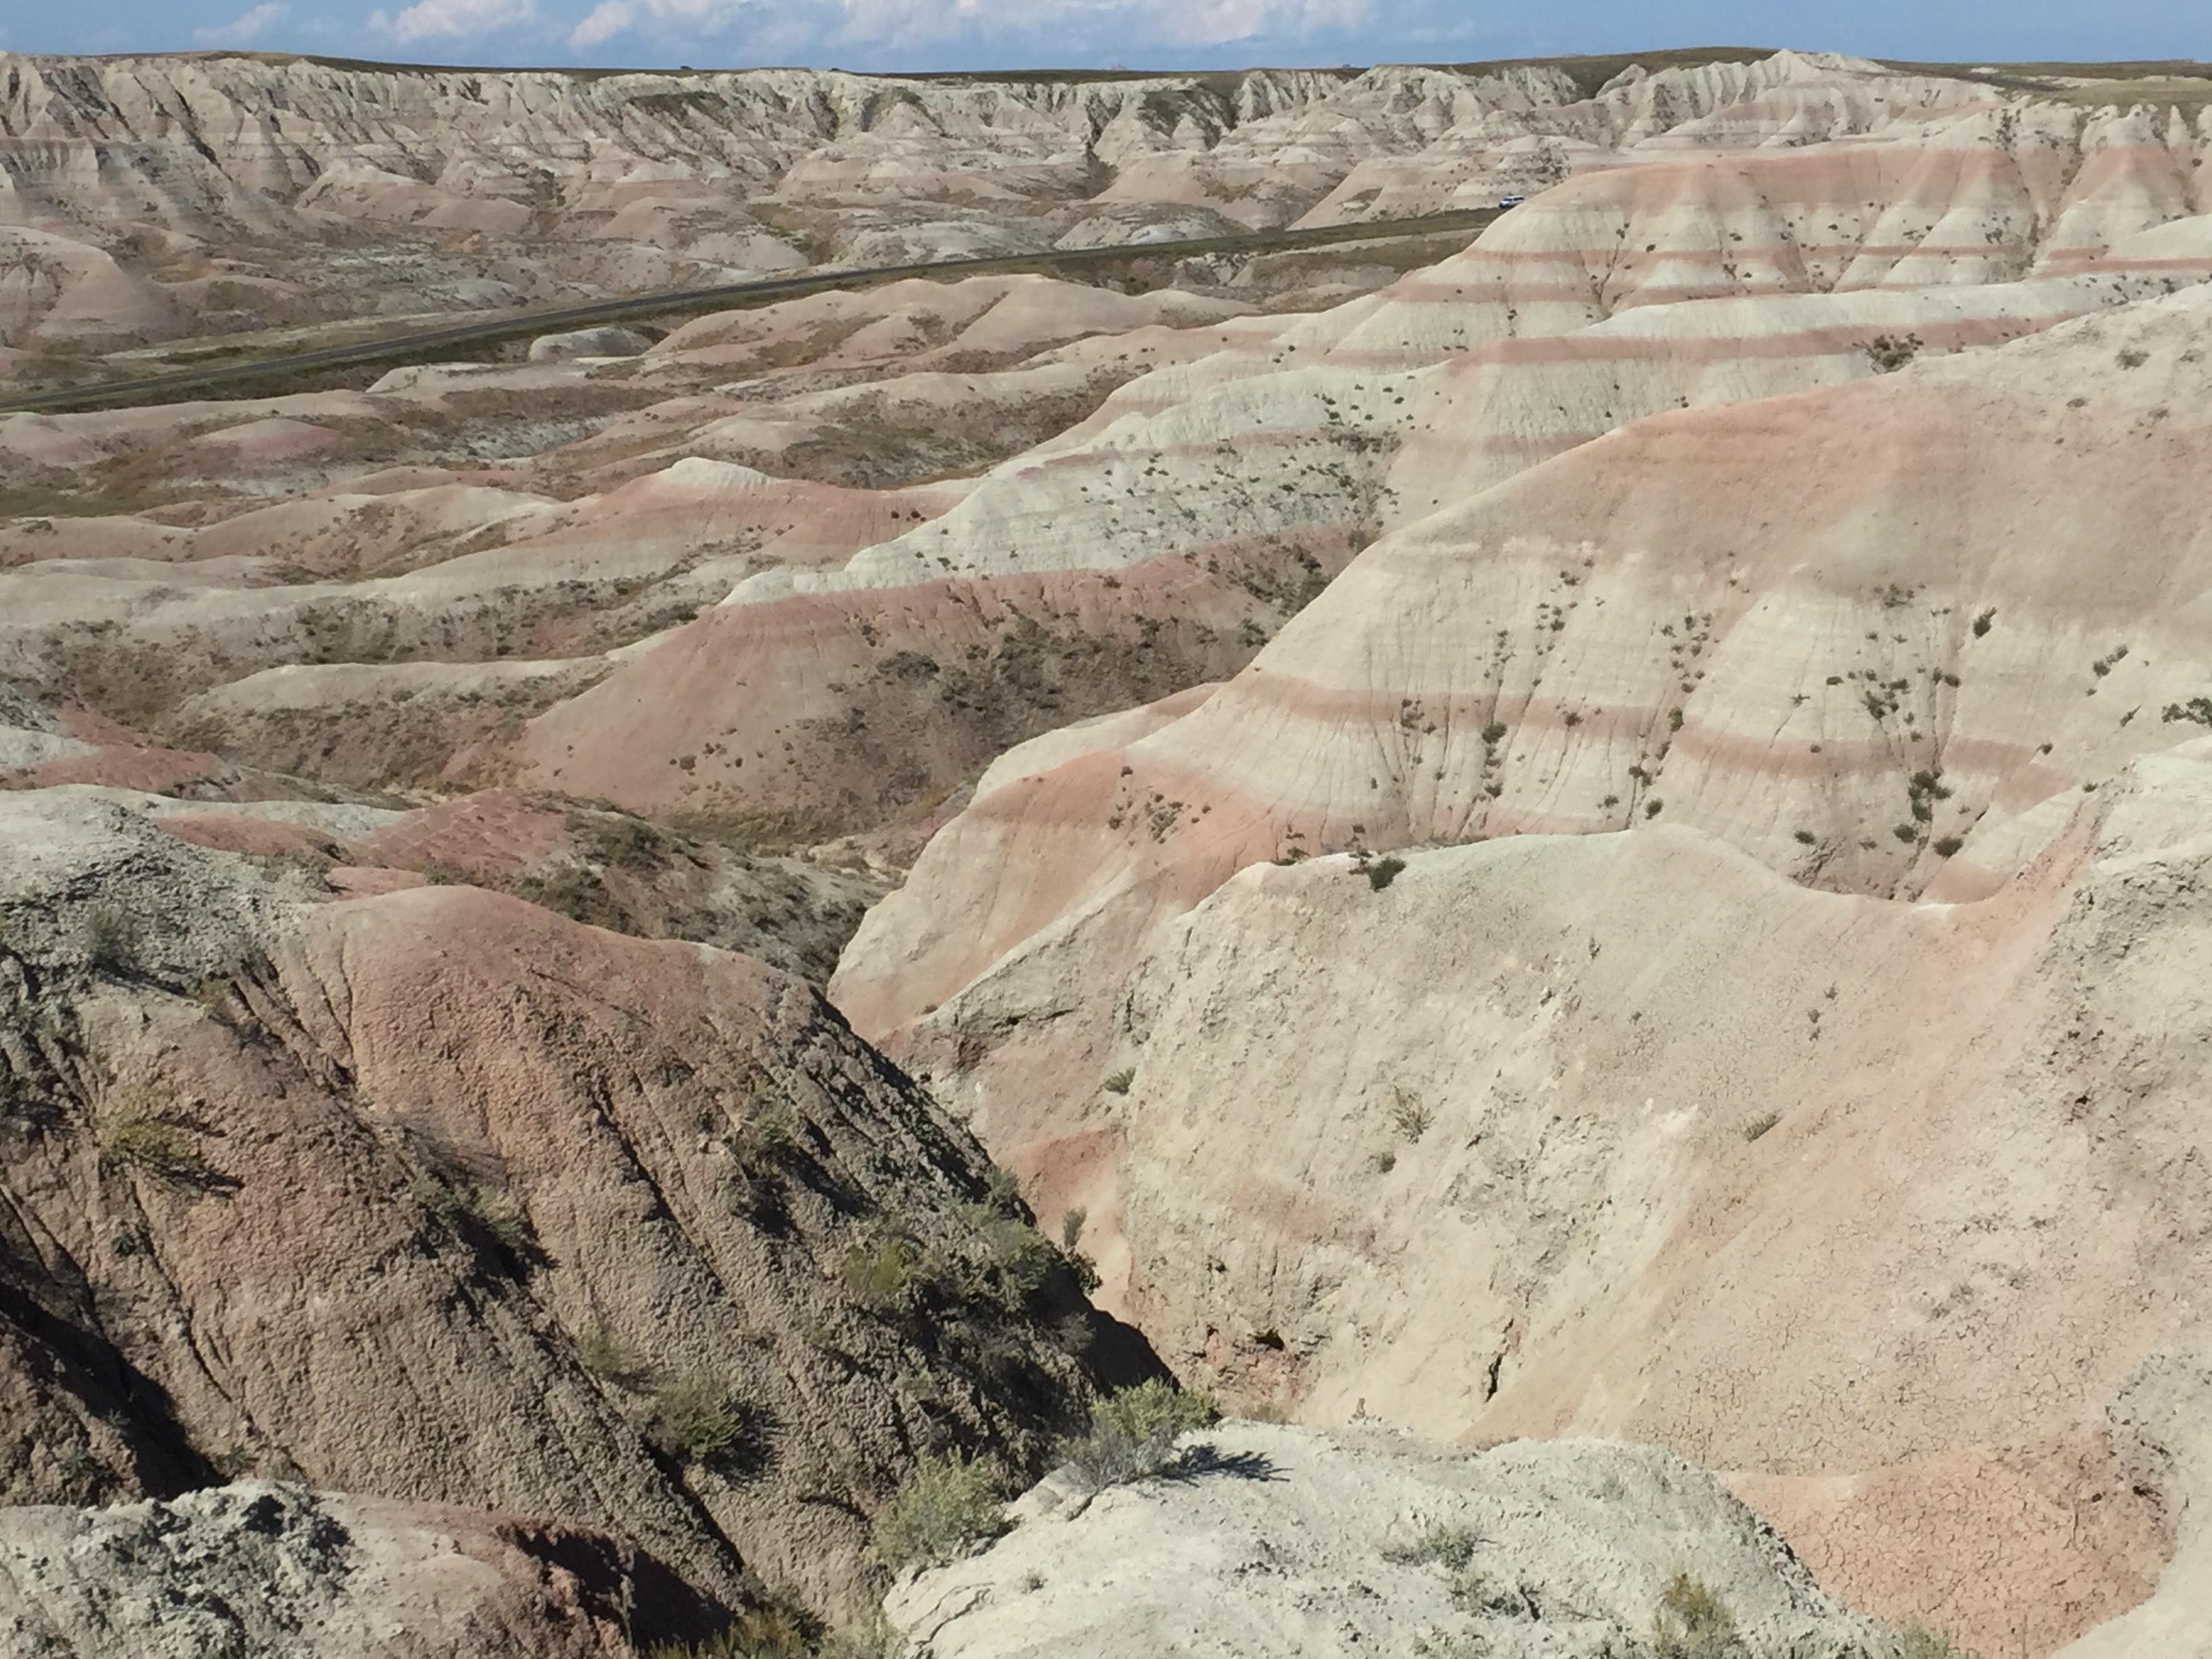 South Dakota's Bad lands